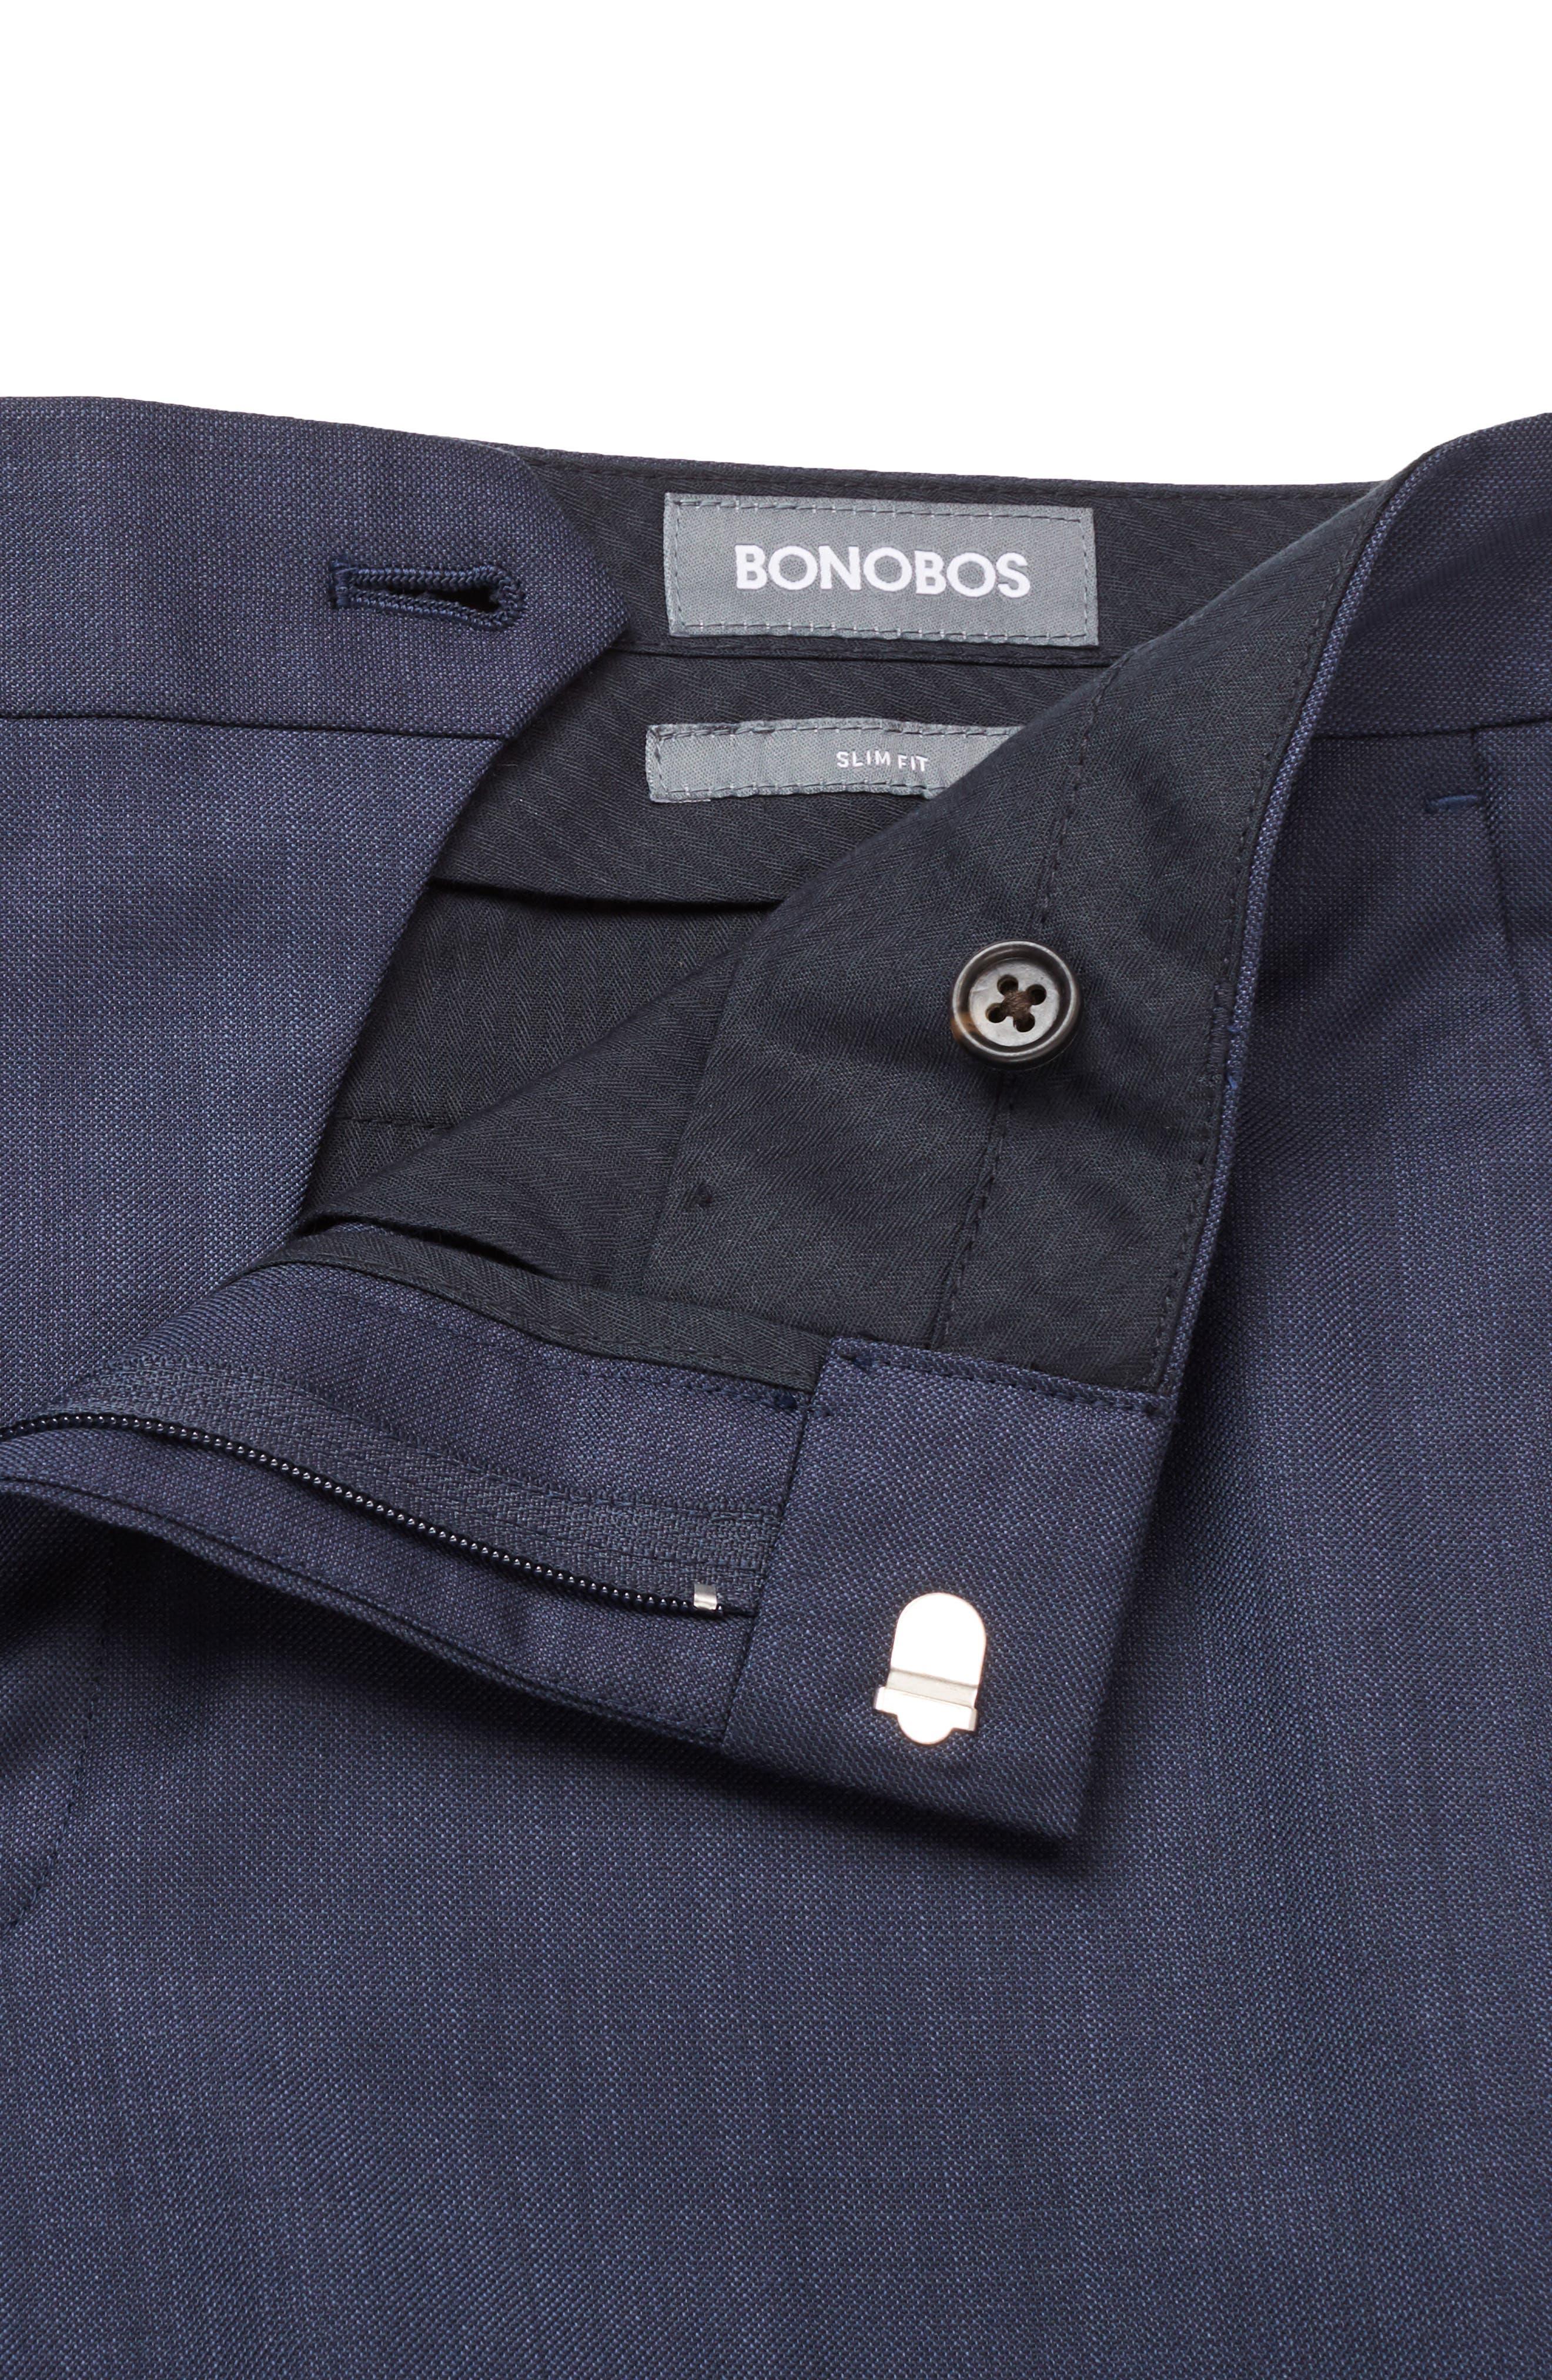 Alternate Image 3  - Bonobos Jetsetter Flat Front Plaid Stretch Wool Trousers